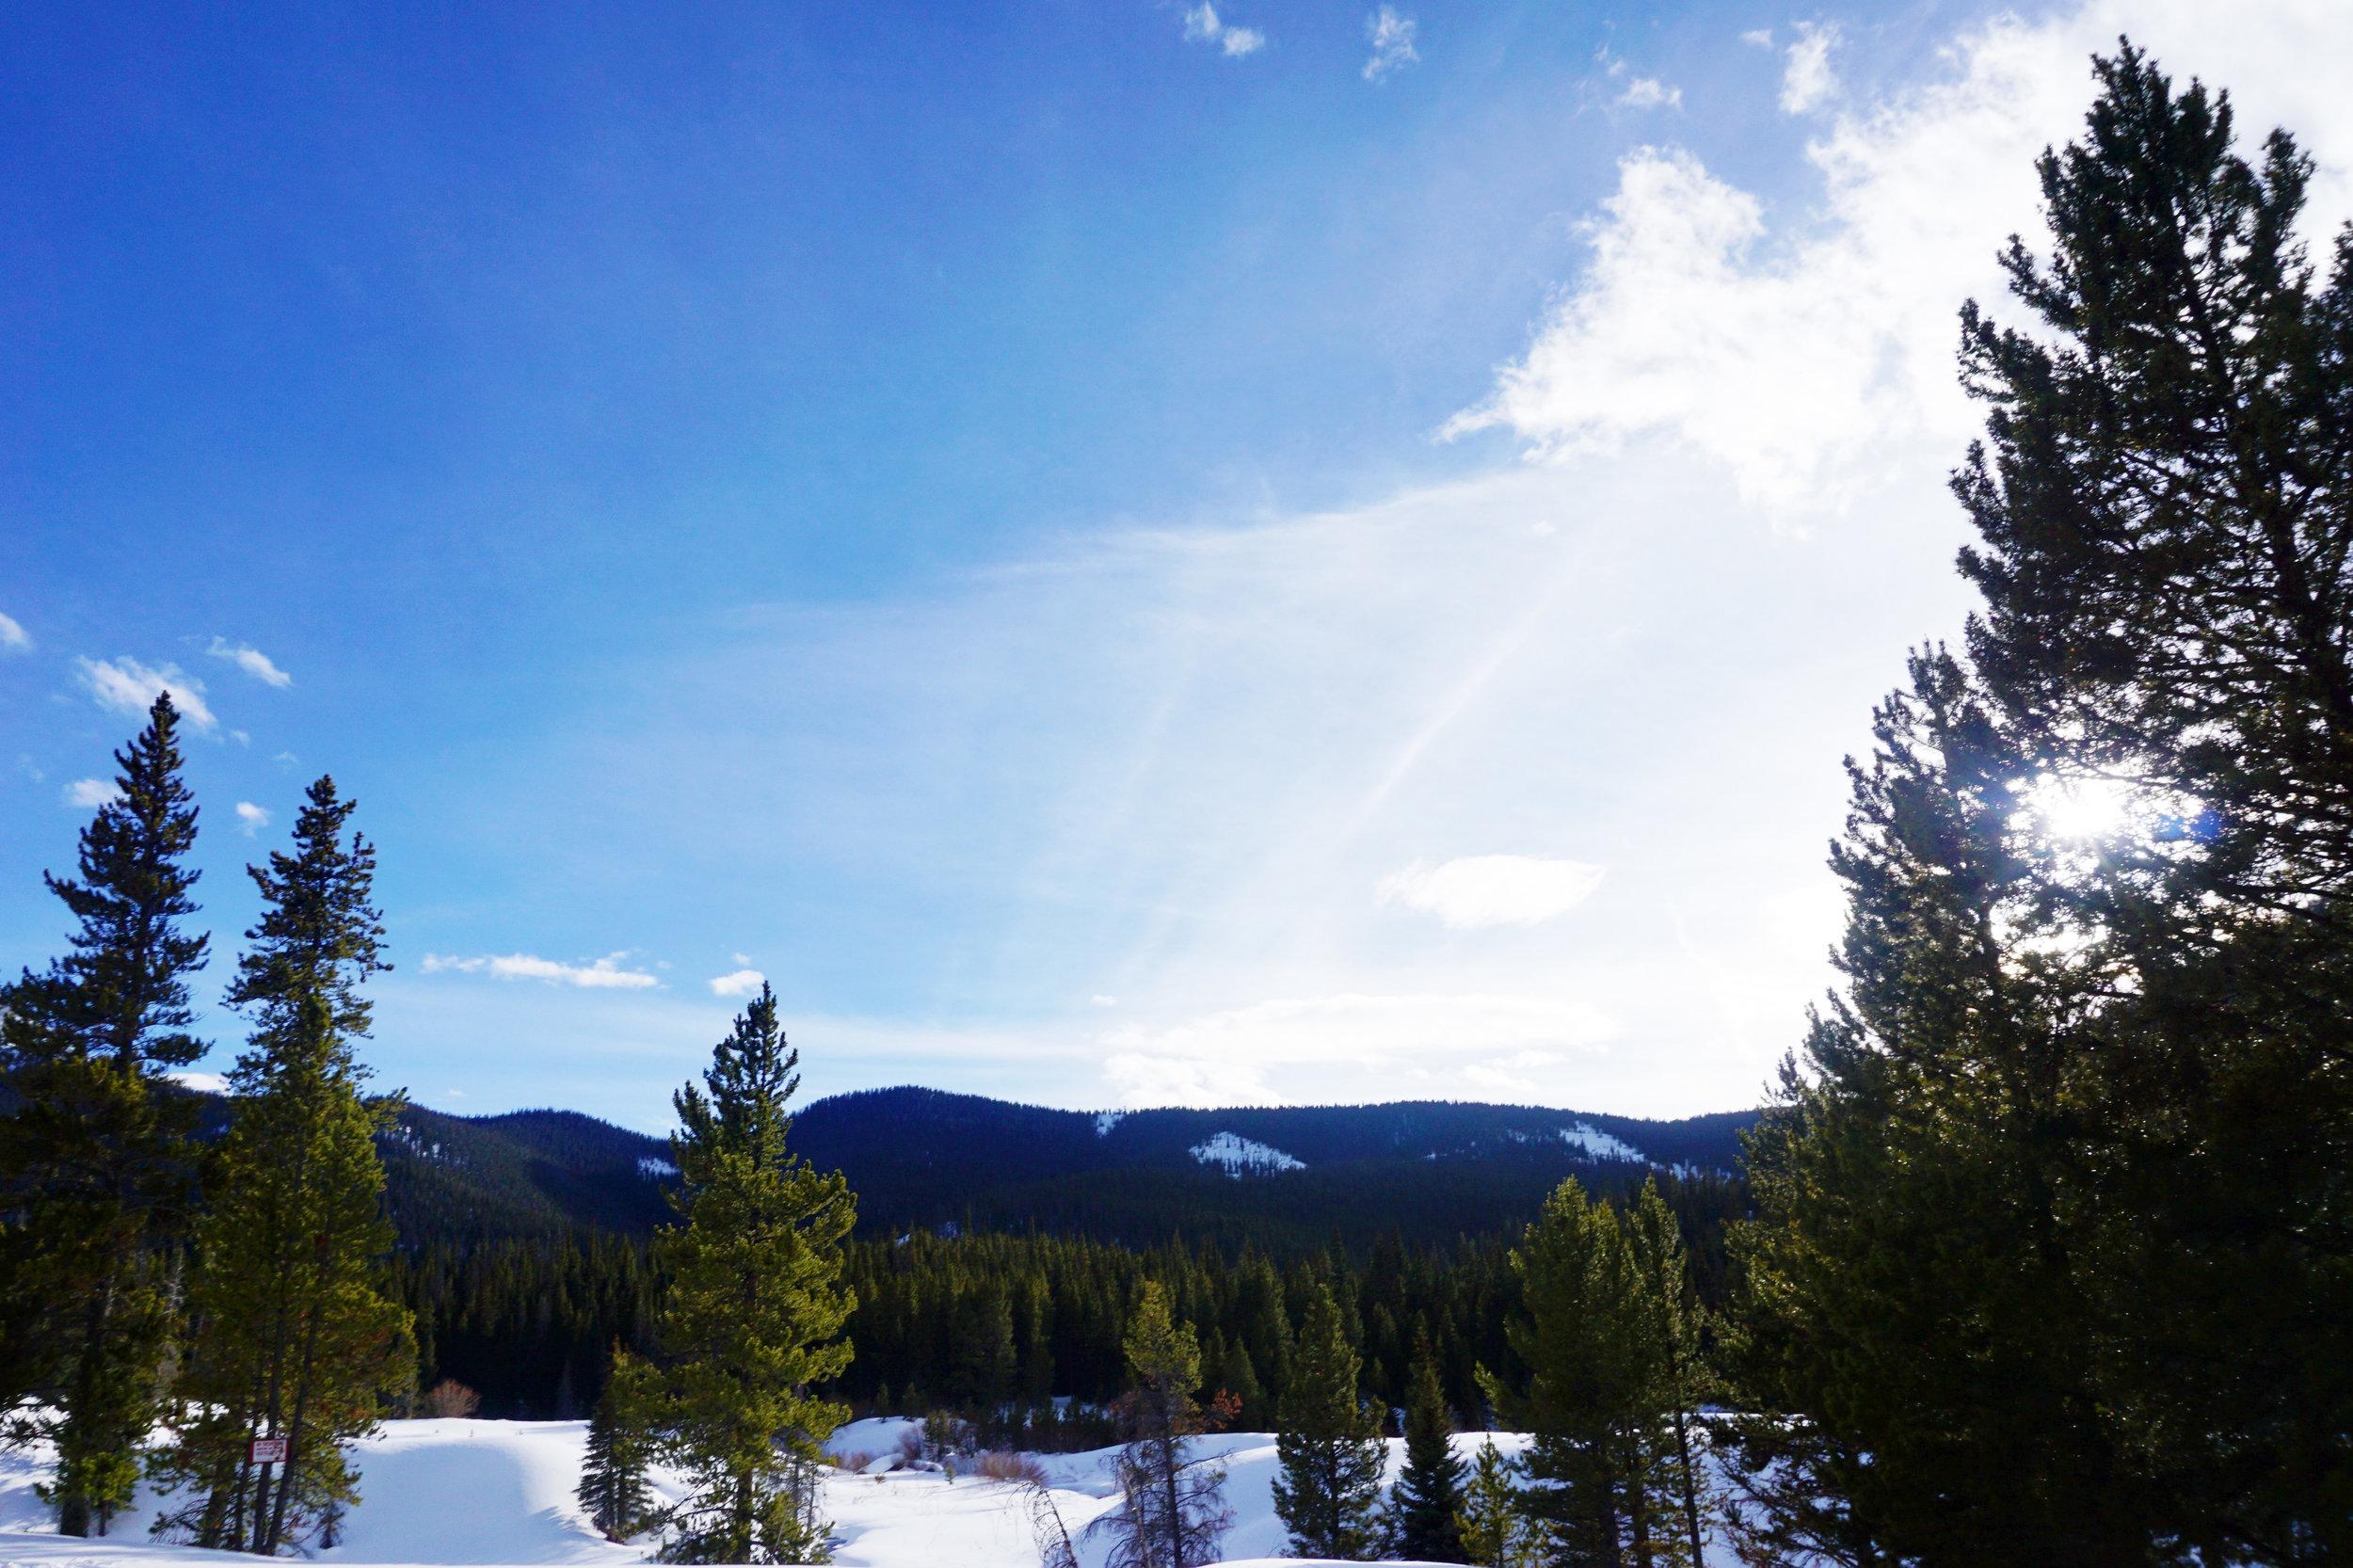 USA_CO_Breck_01.jpg